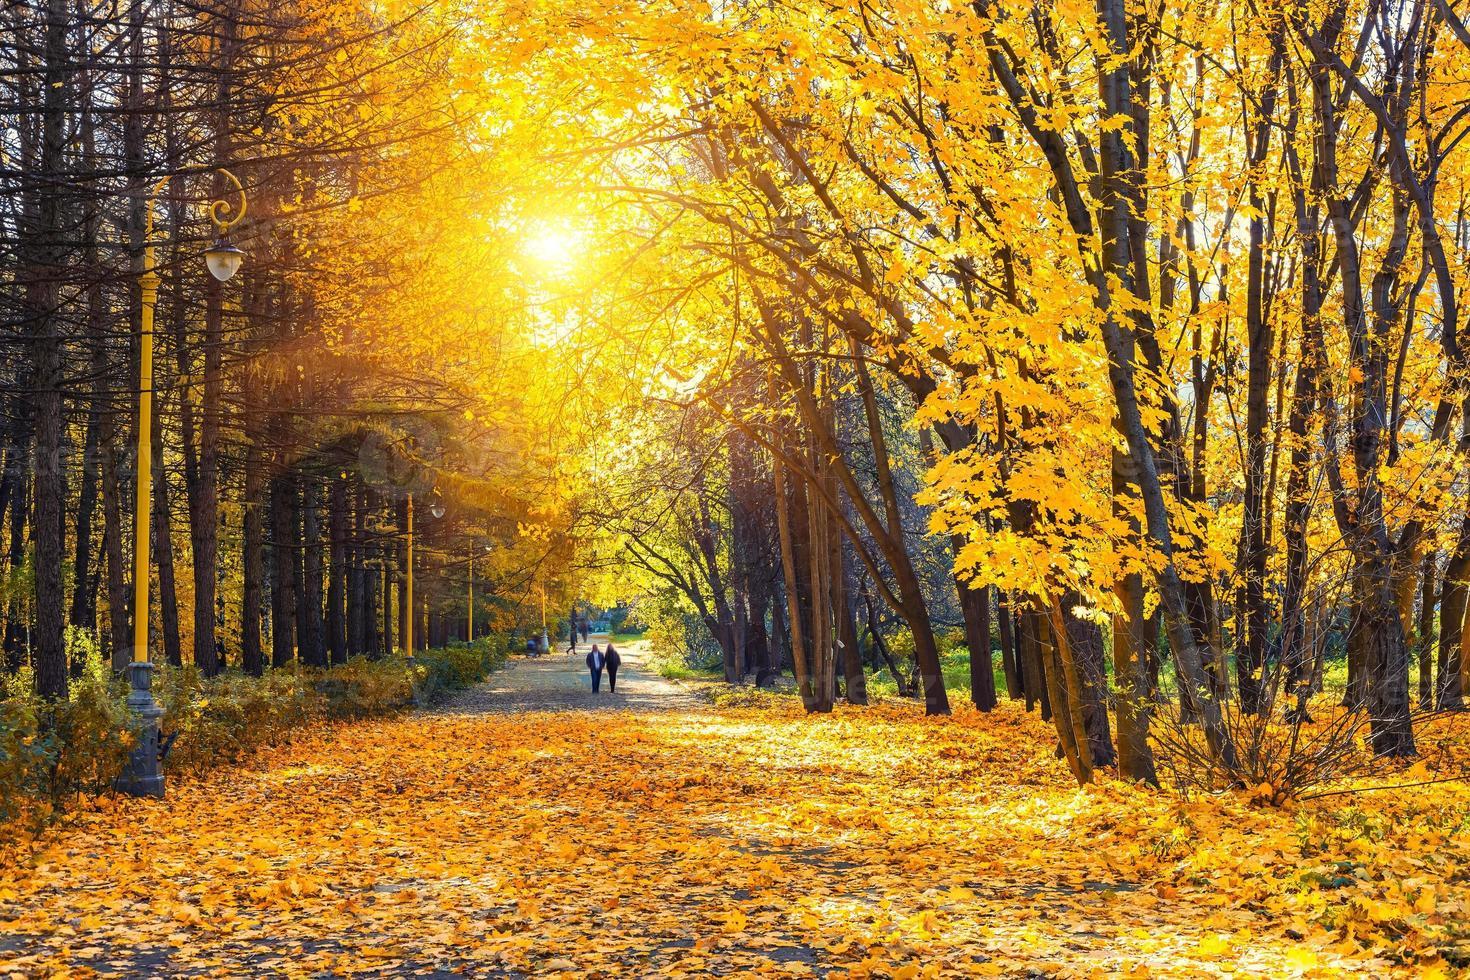 Sunny autumn park photo